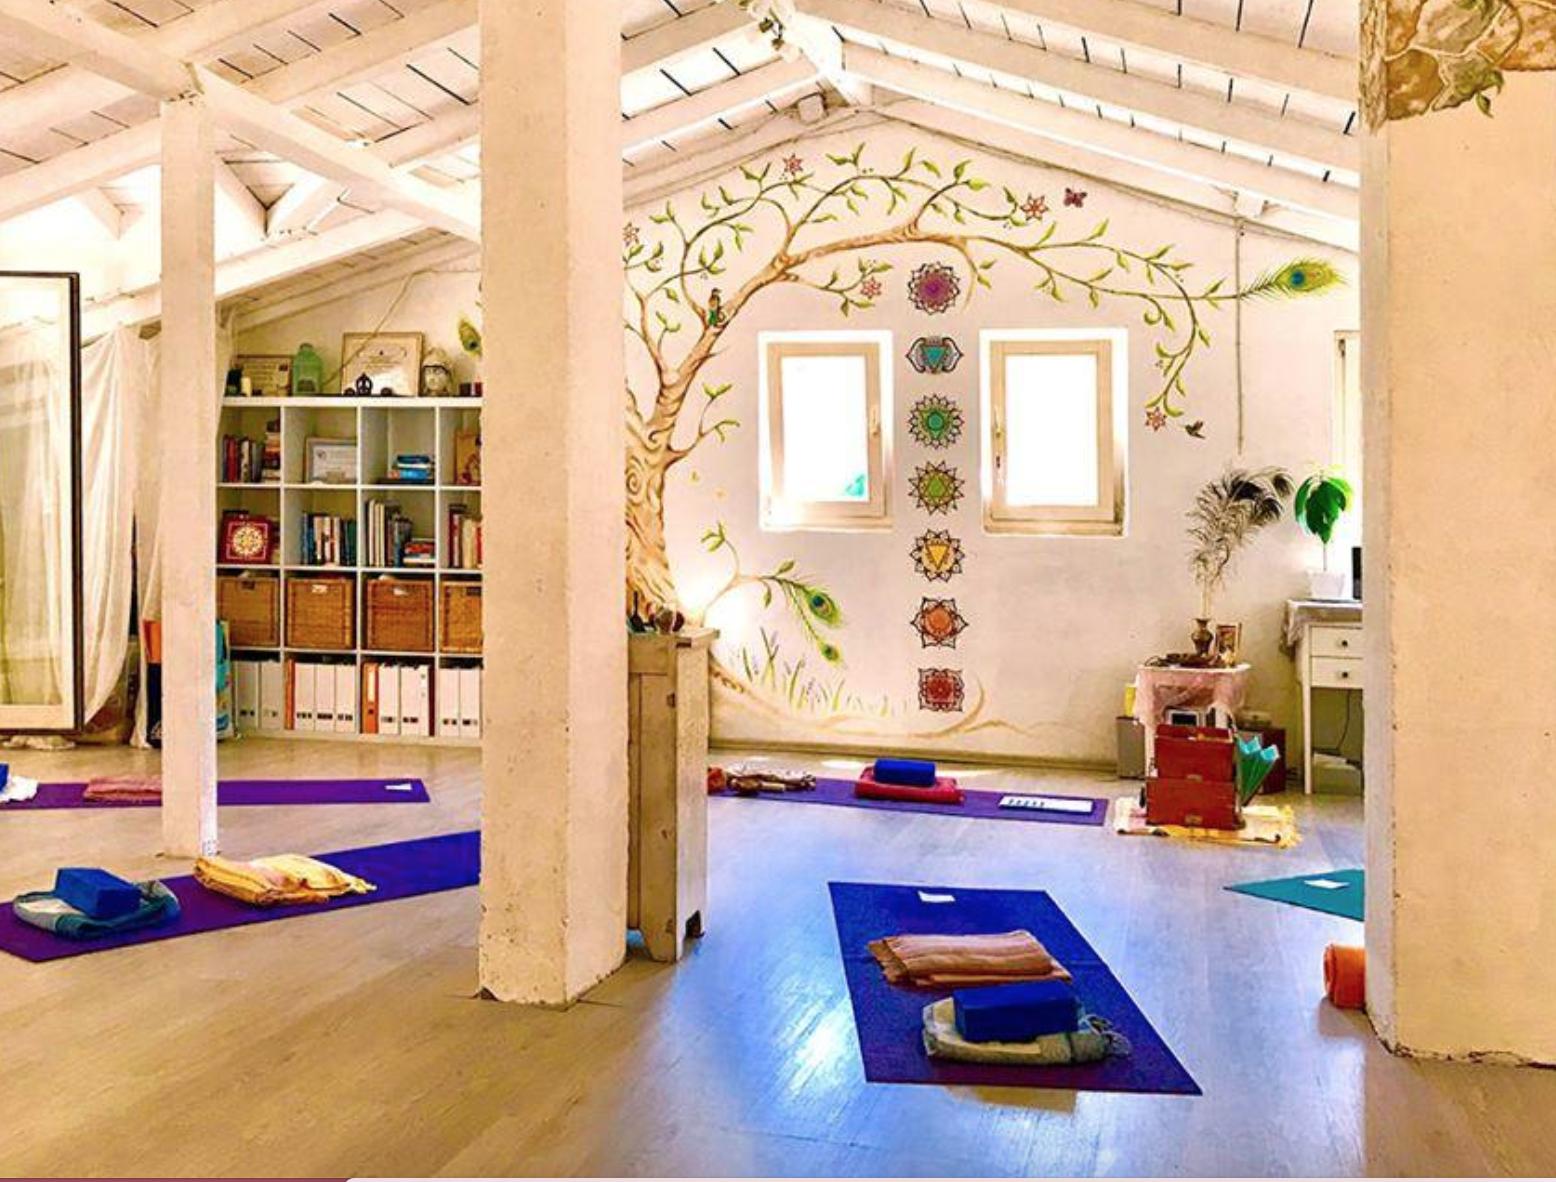 yoga retreats july 2022 hvar croatia